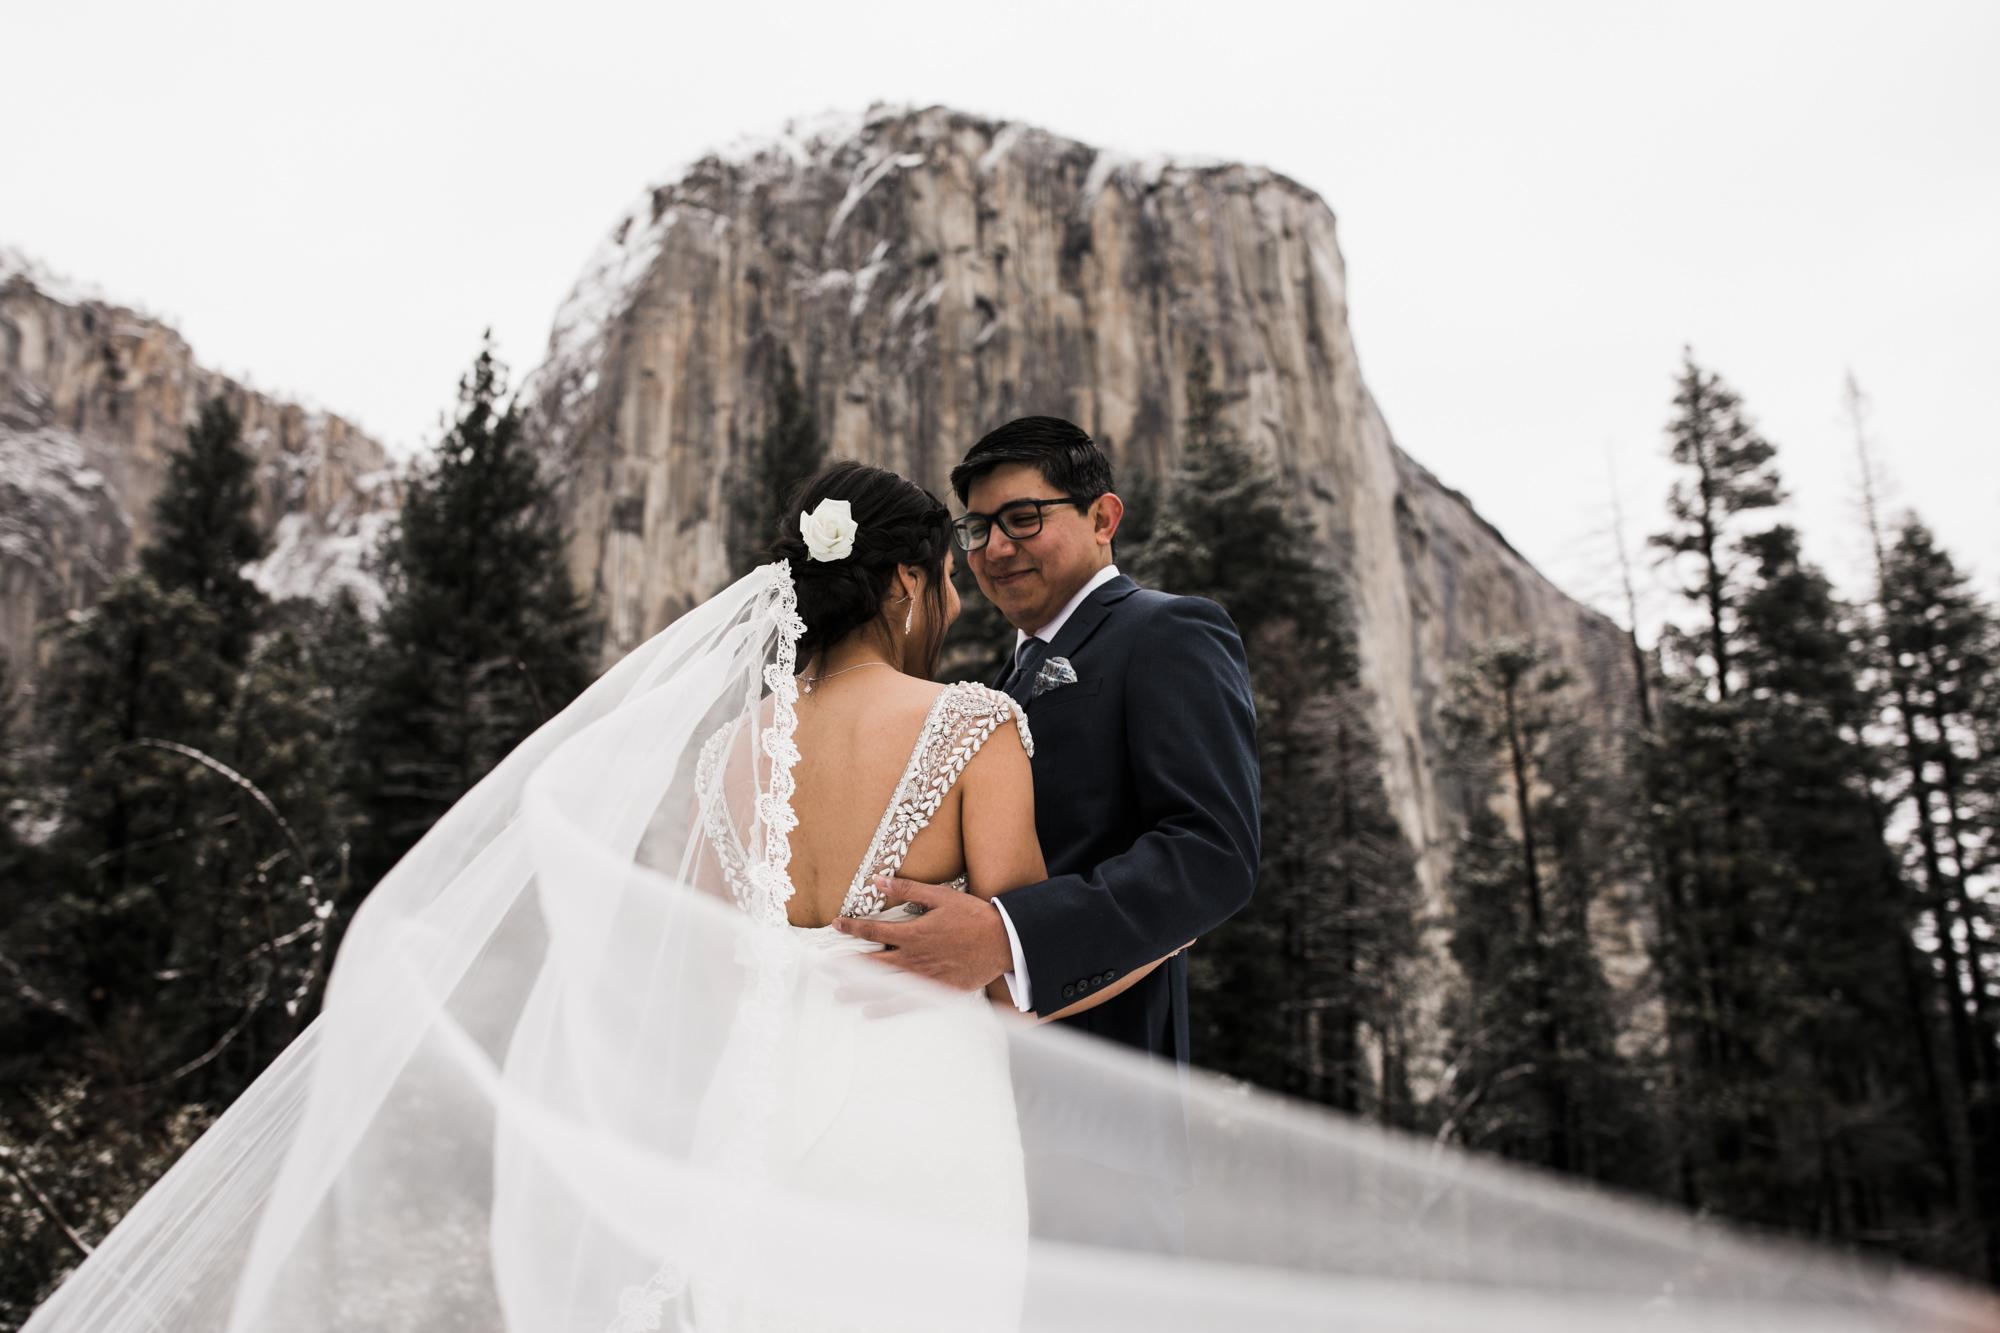 bridal portraits in yosemite national park